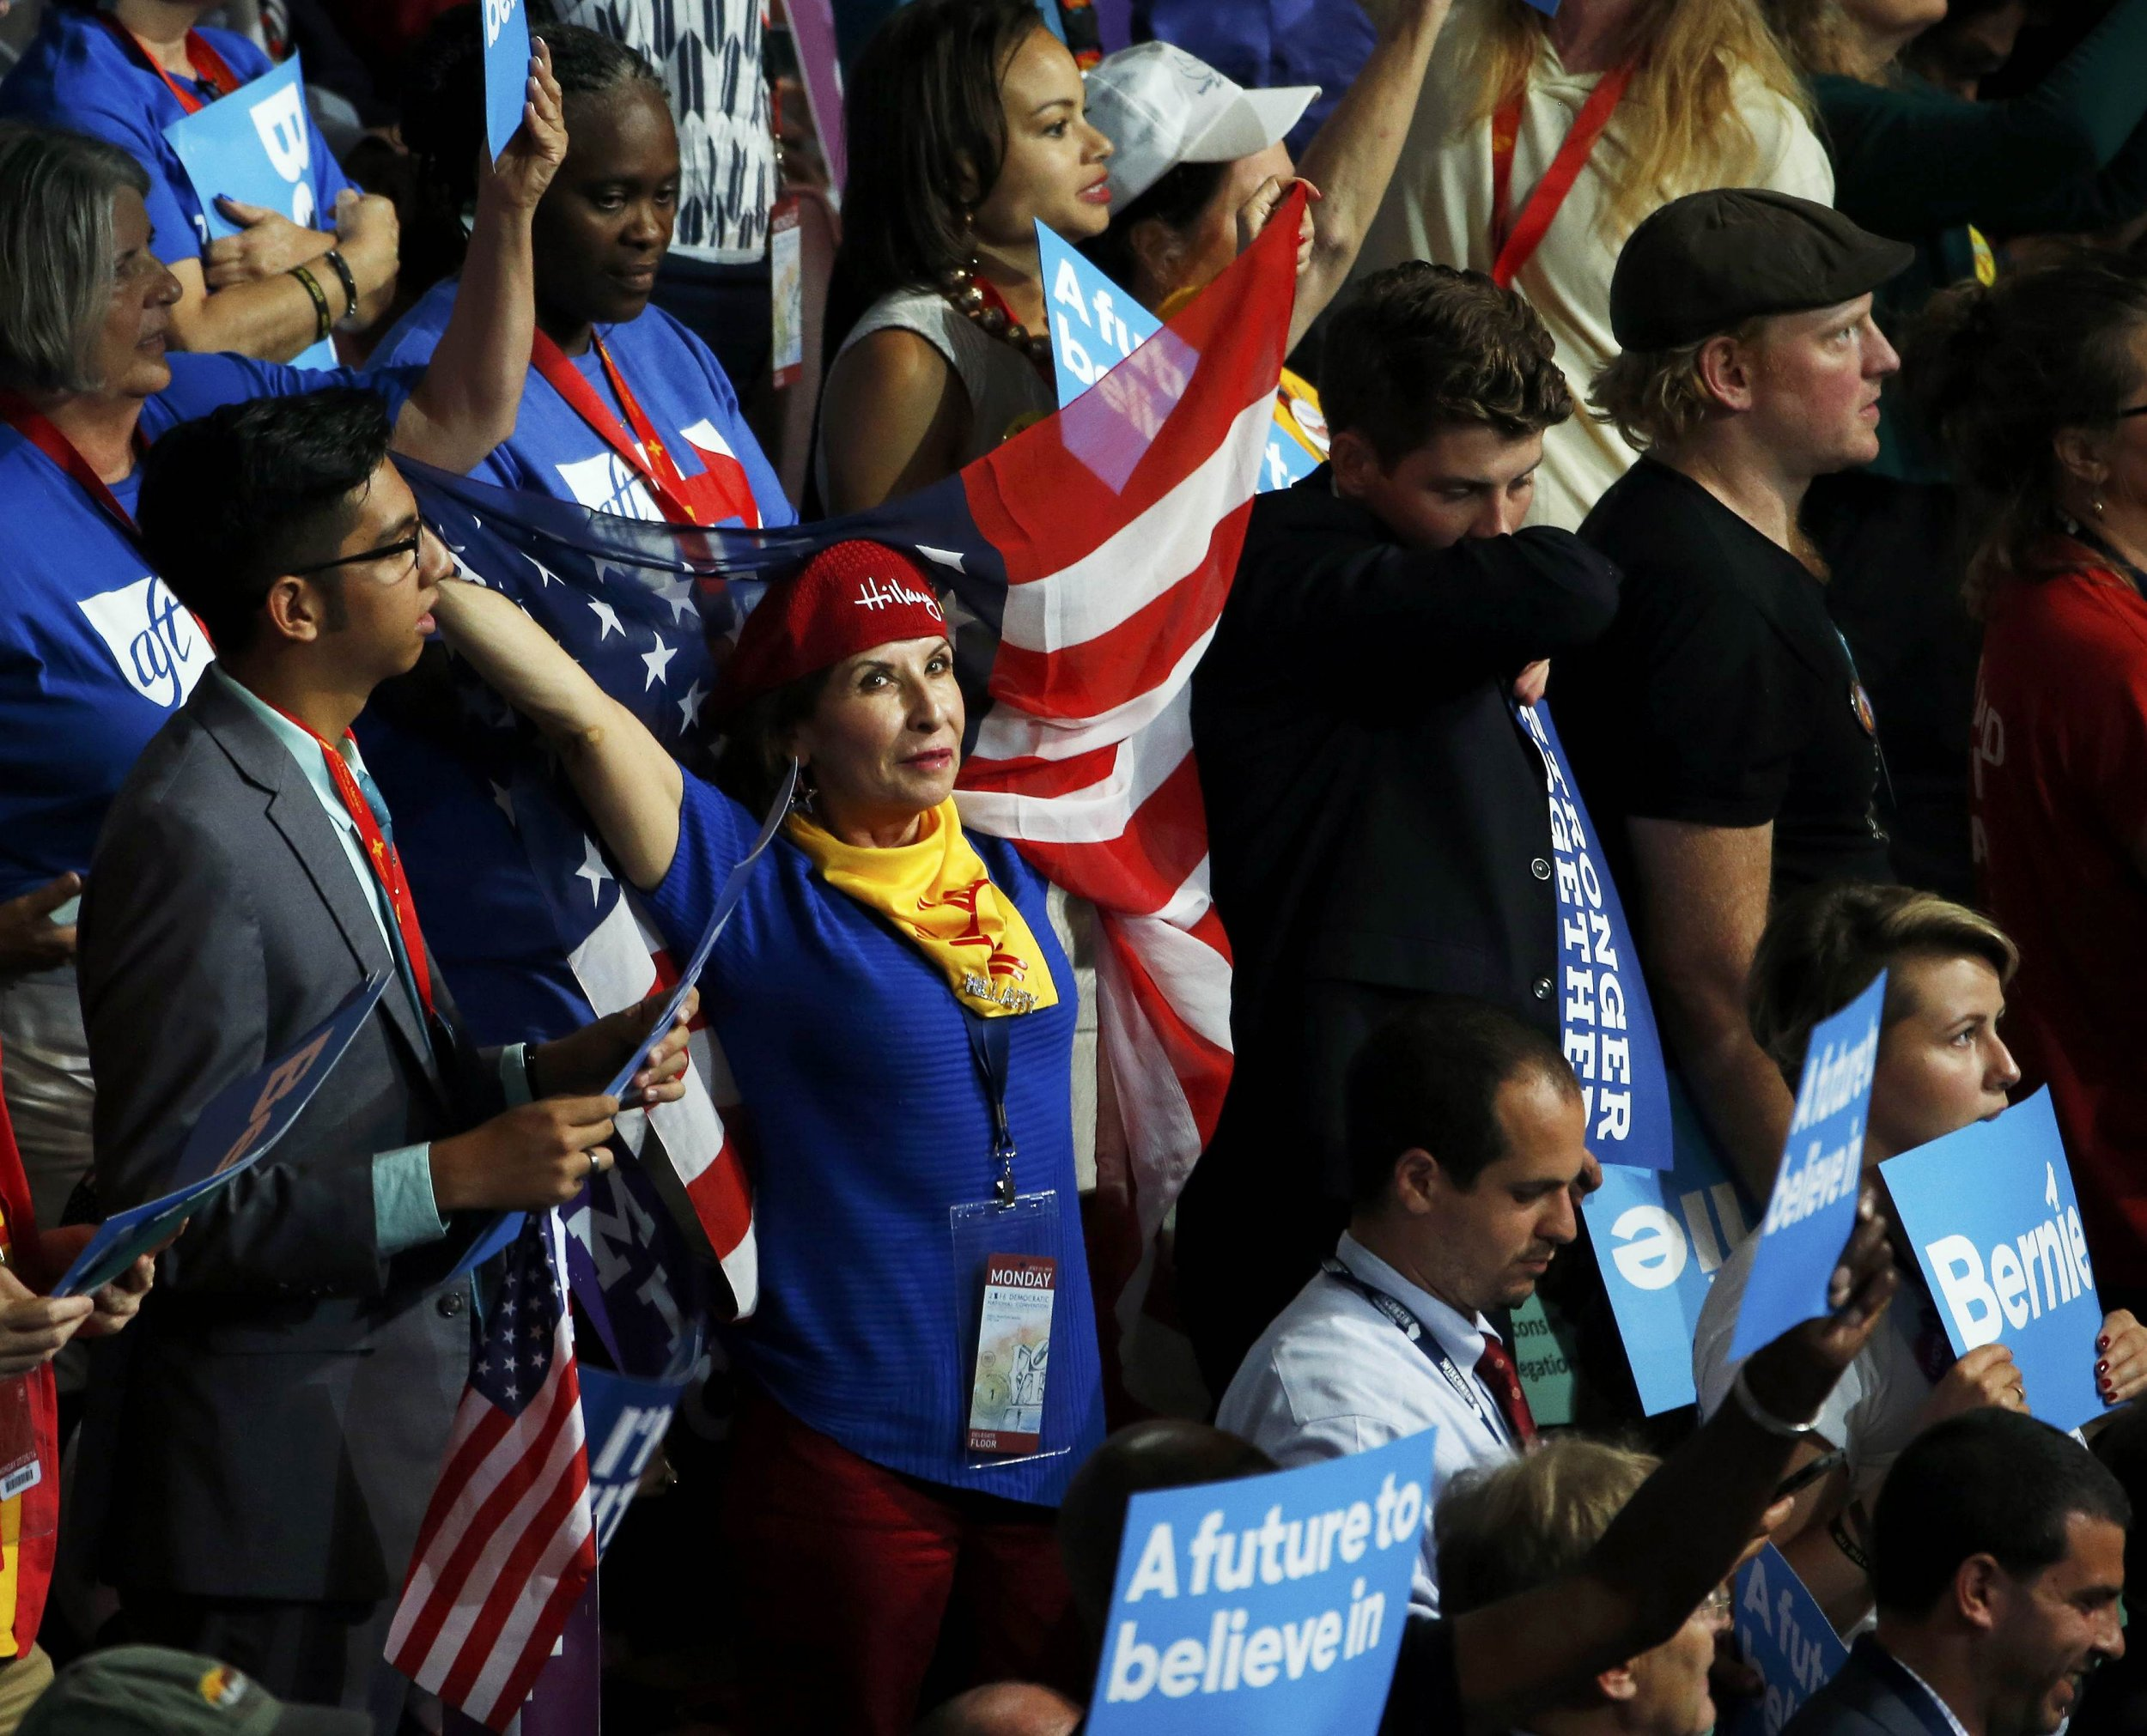 2016-07-26T030554Z_1524491036_HT1EC7Q08KUYT_RTRMADP_3_USA-ELECTION